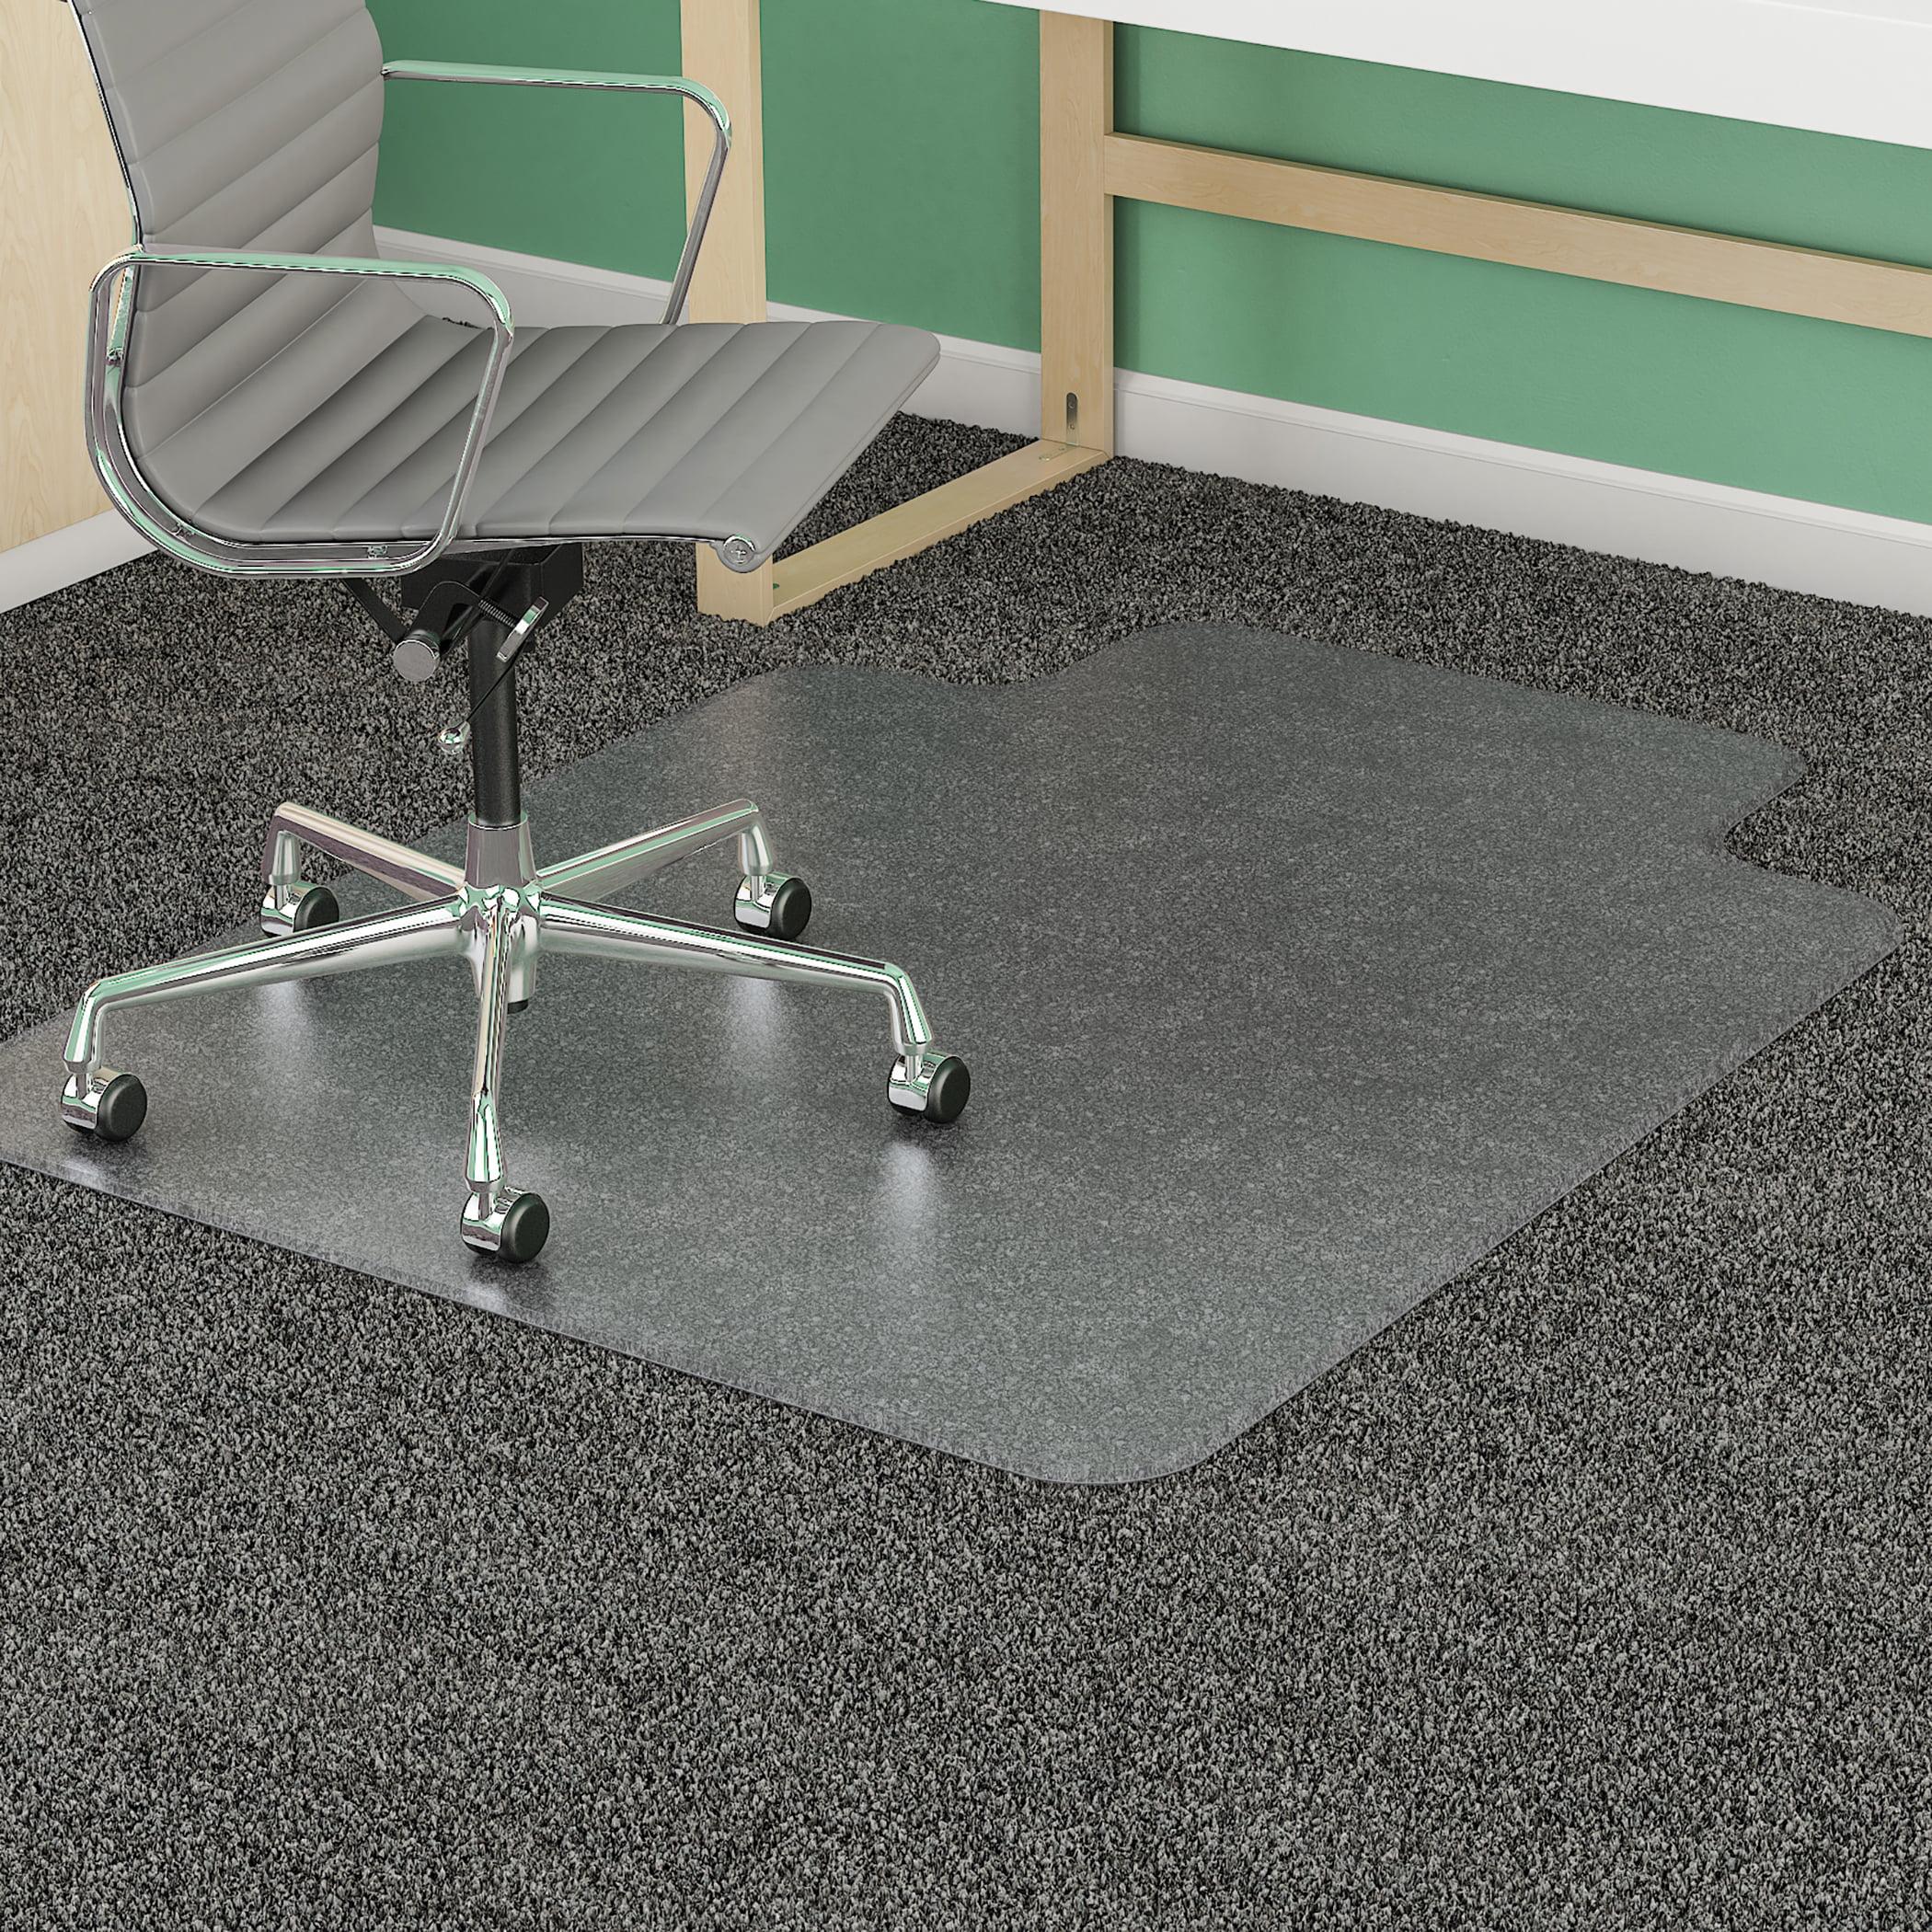 "CM14233 Office reception home carpet floor protector Super chair mat Beveled Edge 45"" x 53"" Clear Lip (25""x12"") Medium Pile Thickness Mat"